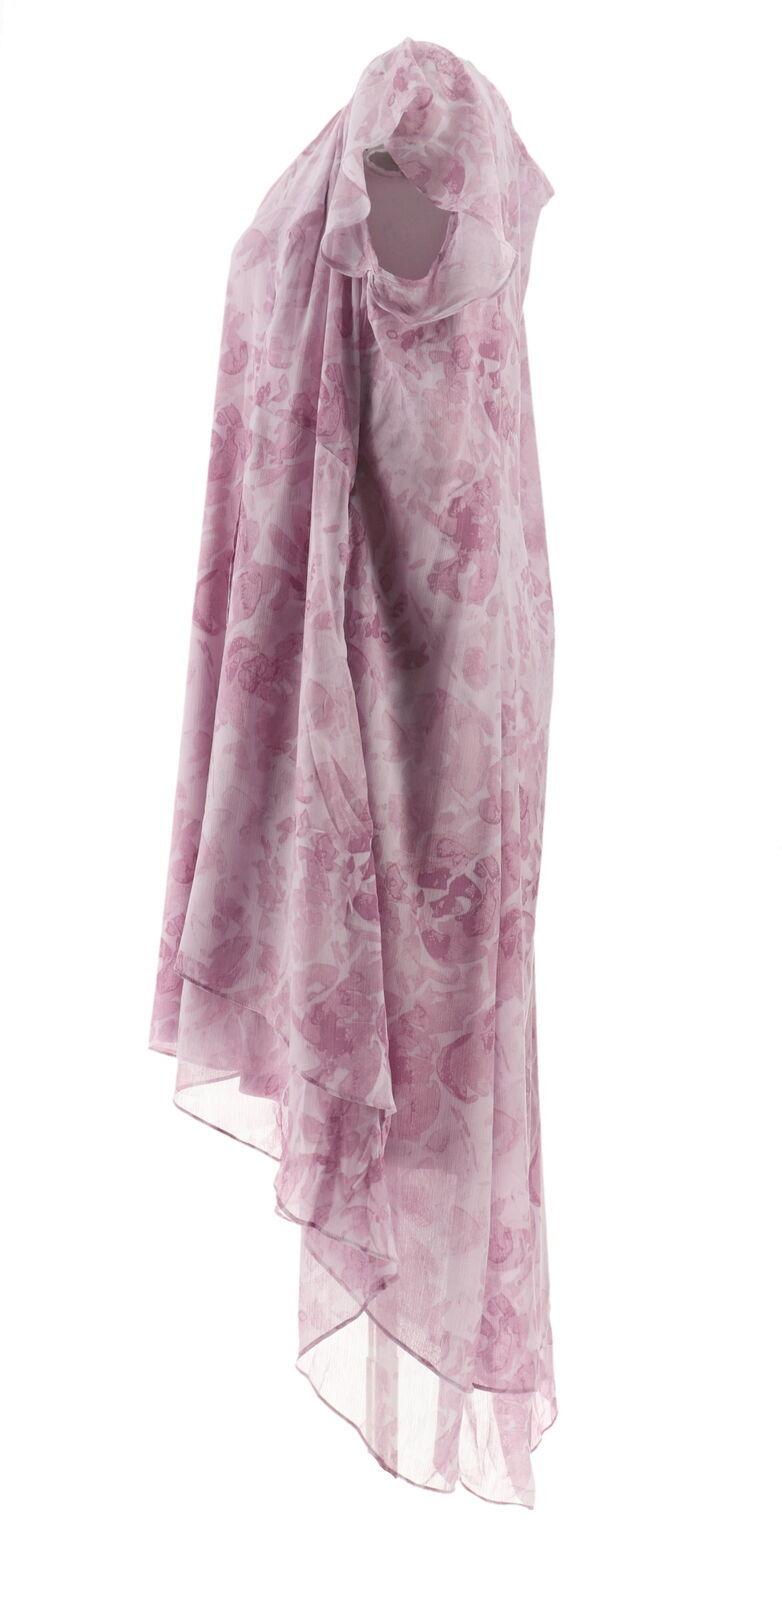 H Halston Petite Rose Print Cap Slv Hi-Low Dress French Lilac 24P NEW A303199 image 2